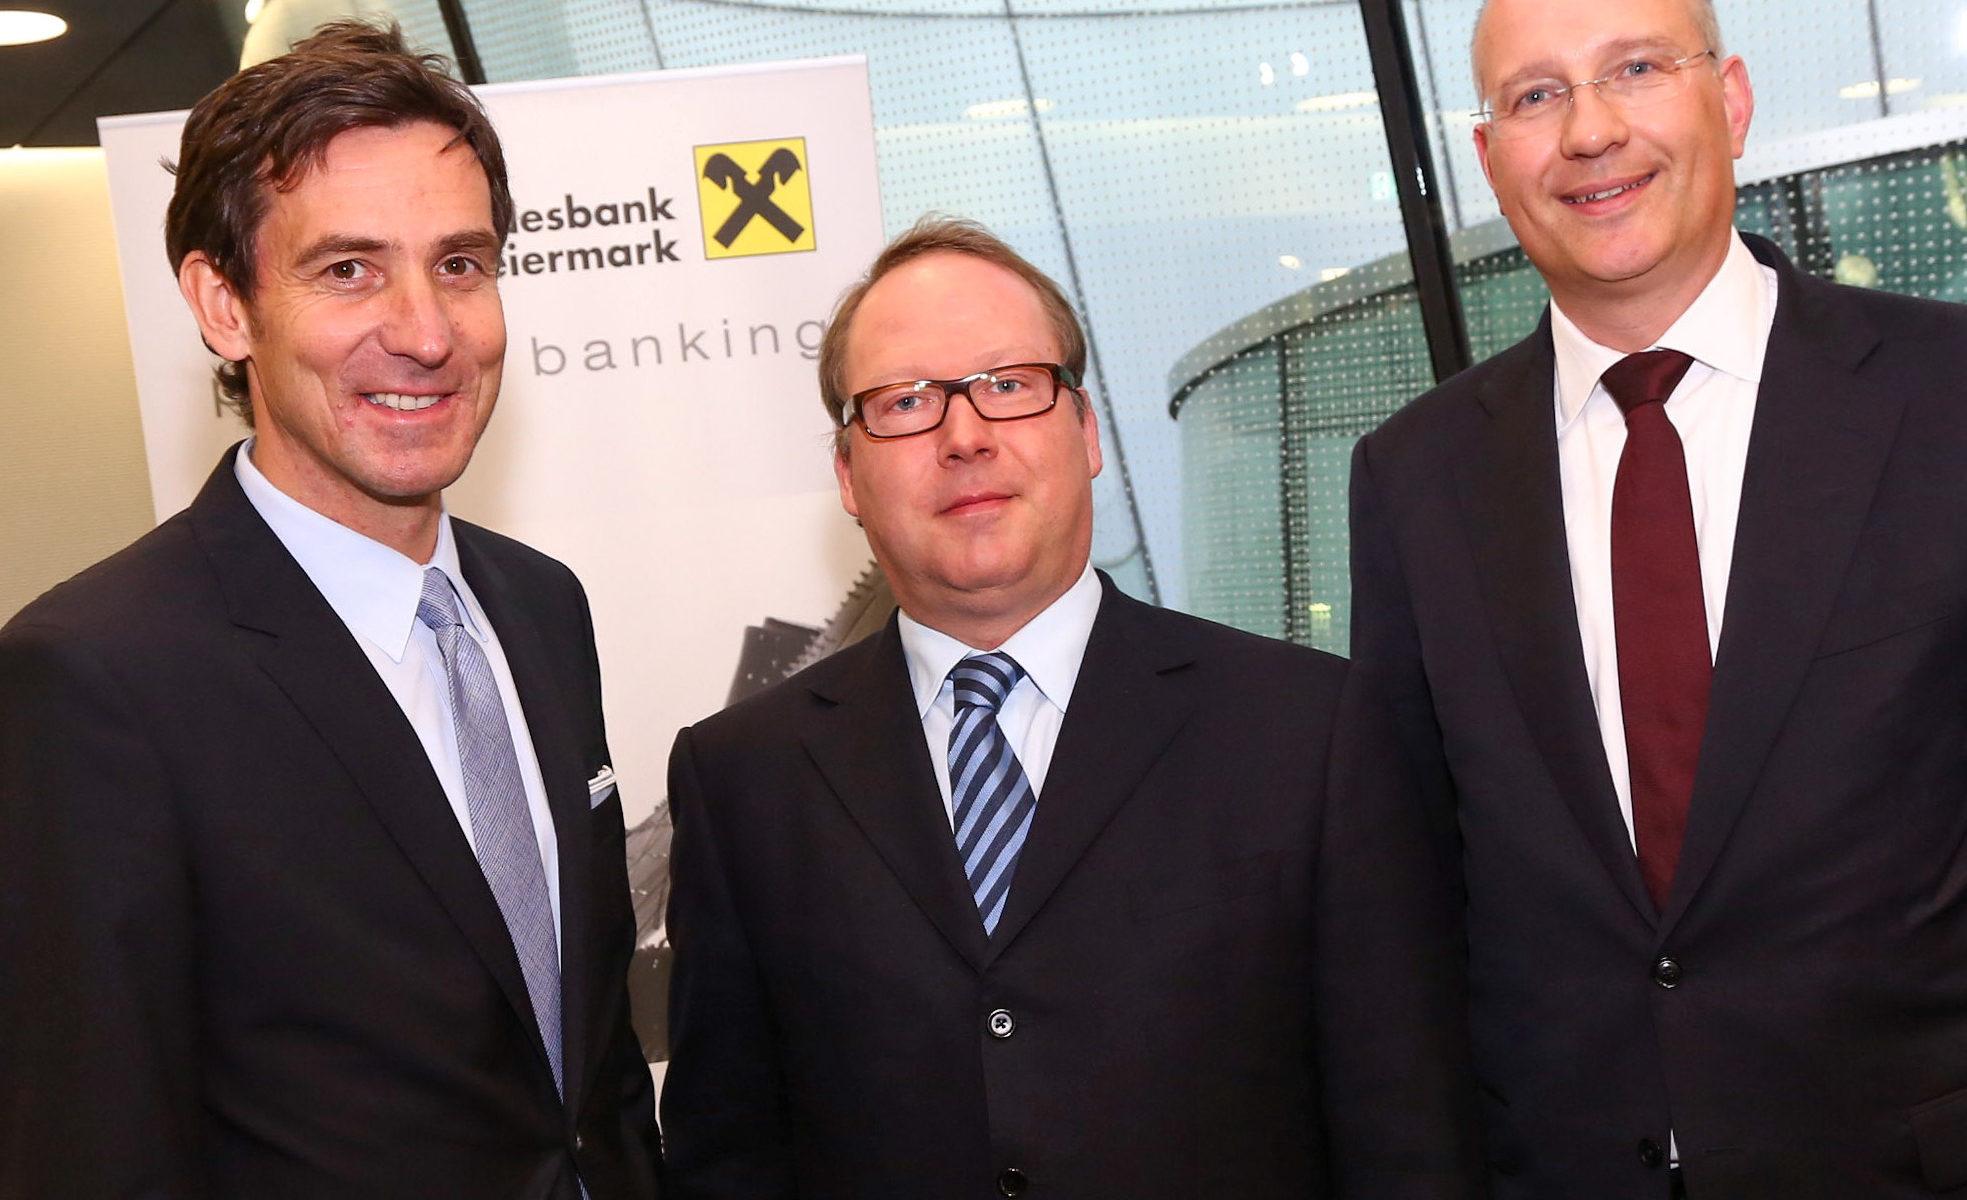 Foto v.l.: RLB Private-Banking-Chef Prok. Mag. Stefan Tschikof, Univ.-Prof. Max Otte und RLB-Vorstandsdirektor Dkfm. Arndt Hallmann.